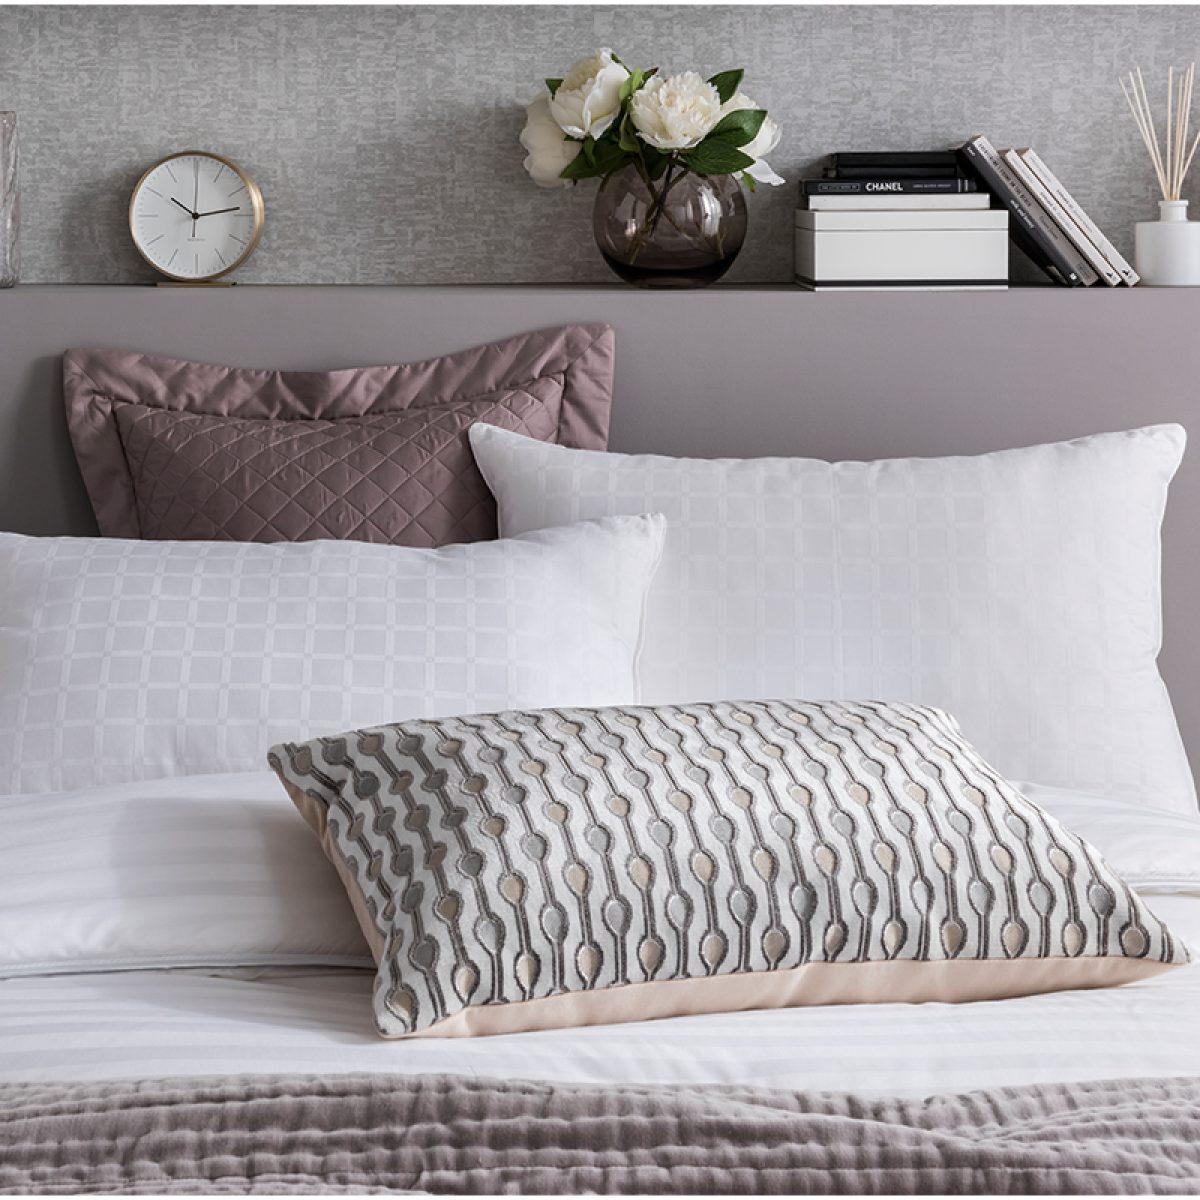 Boutique silk check pillow cameo v2 web 1024x1024